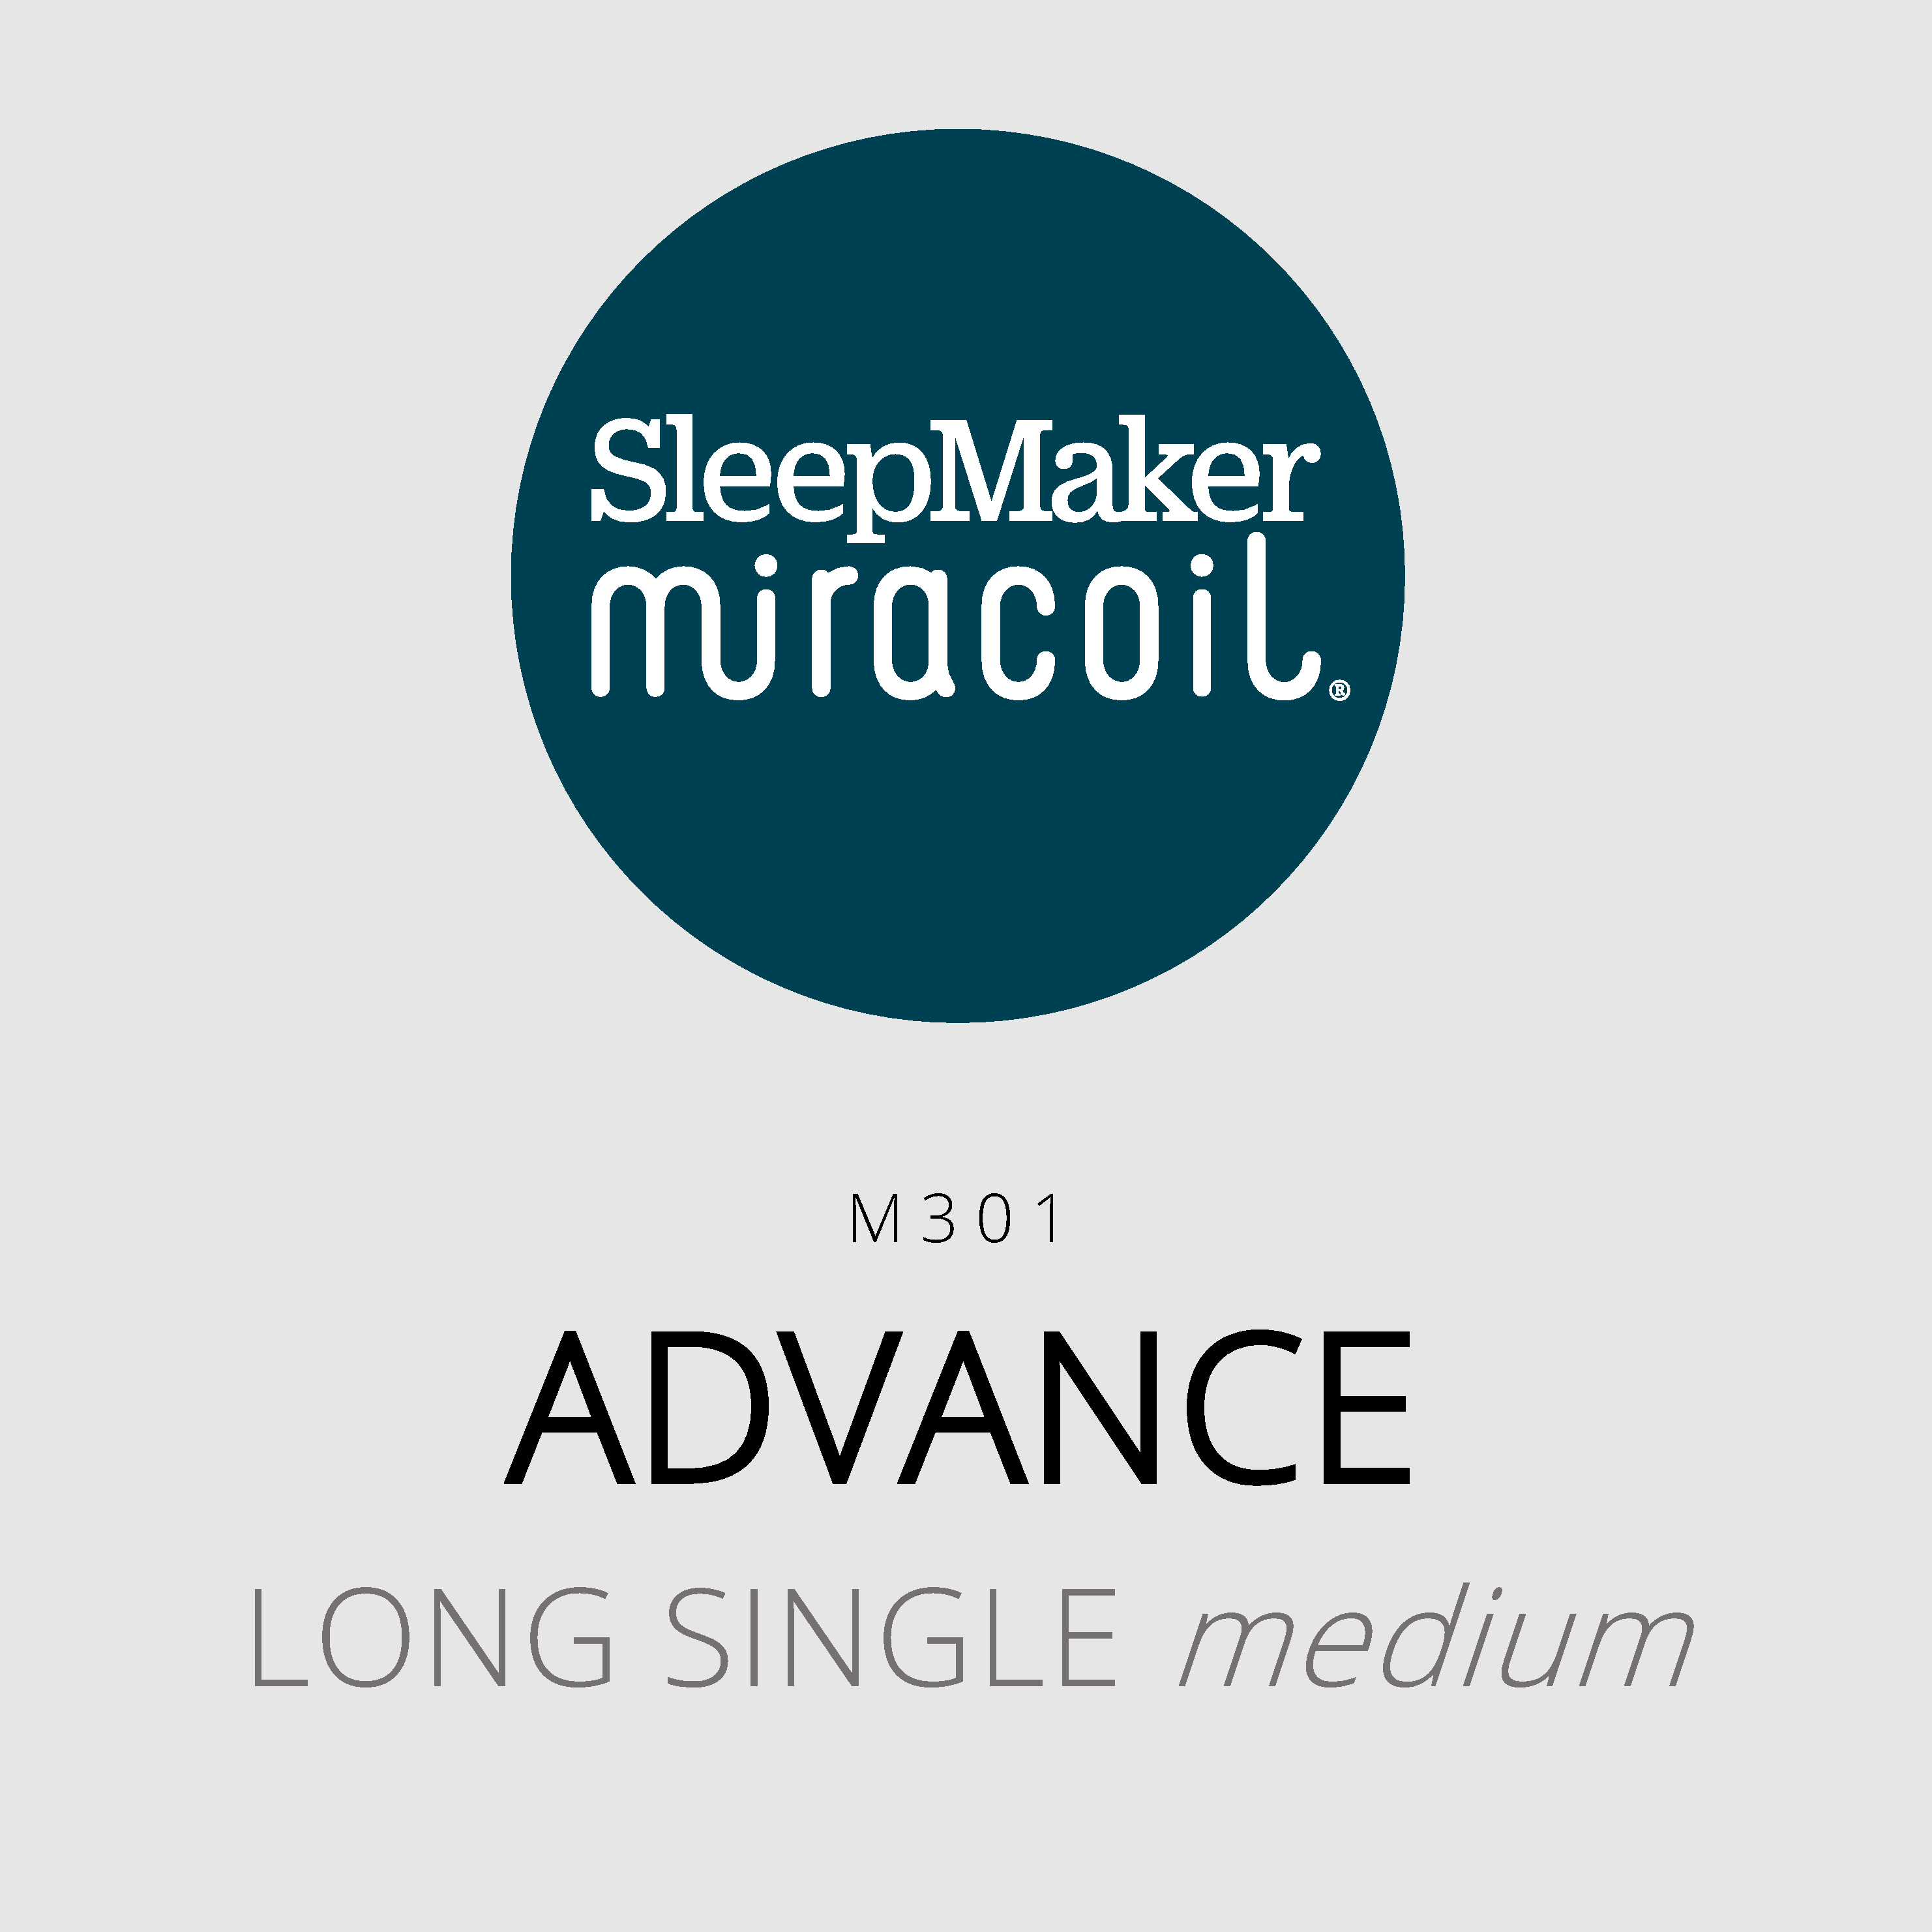 SleepMaker Miracoil – Advance – M301 – Long Single Medium Mattress